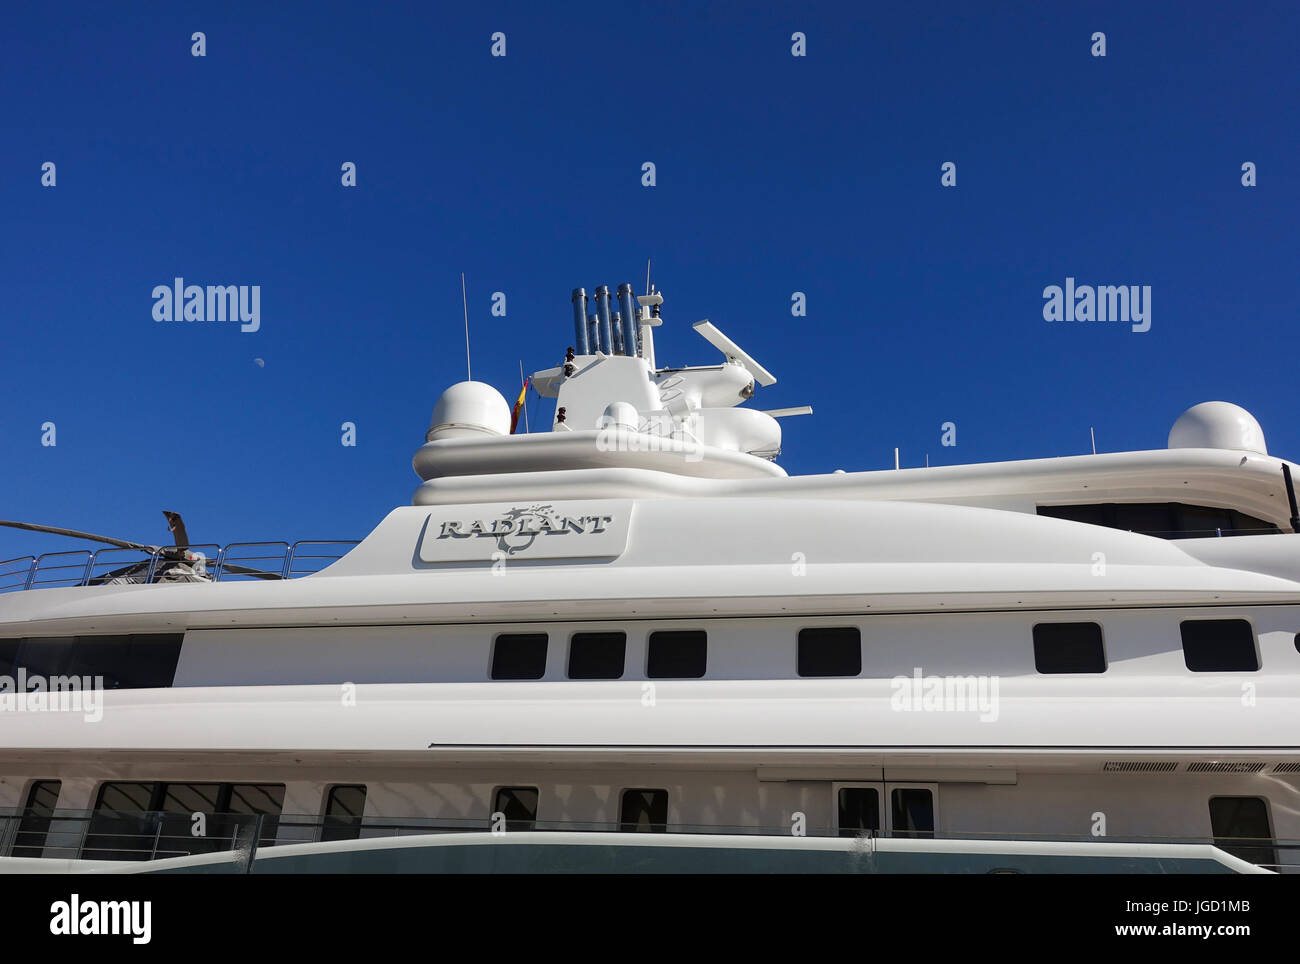 240 million euros, Mega yacht, super yacht, yacht, yachts, owned by Abdulla al Futtaim, moored in the port of Malaga, - Stock Image